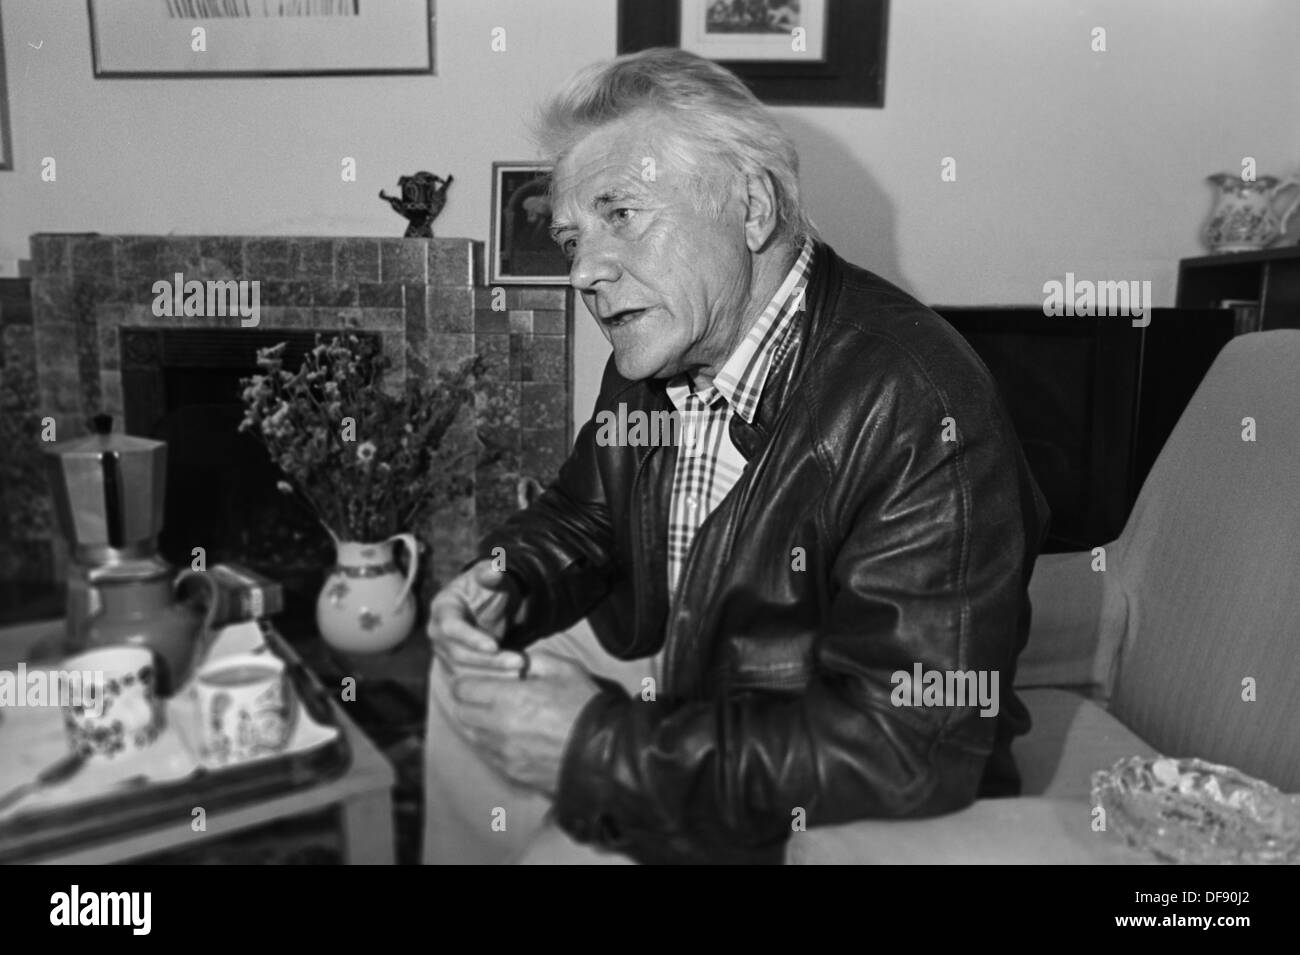 Archivio fotografico: Welsh radicale storico marxista Gwyn Alf Williams a casa in Drefach Felindre, Carmarthenshire, 1991 Immagini Stock